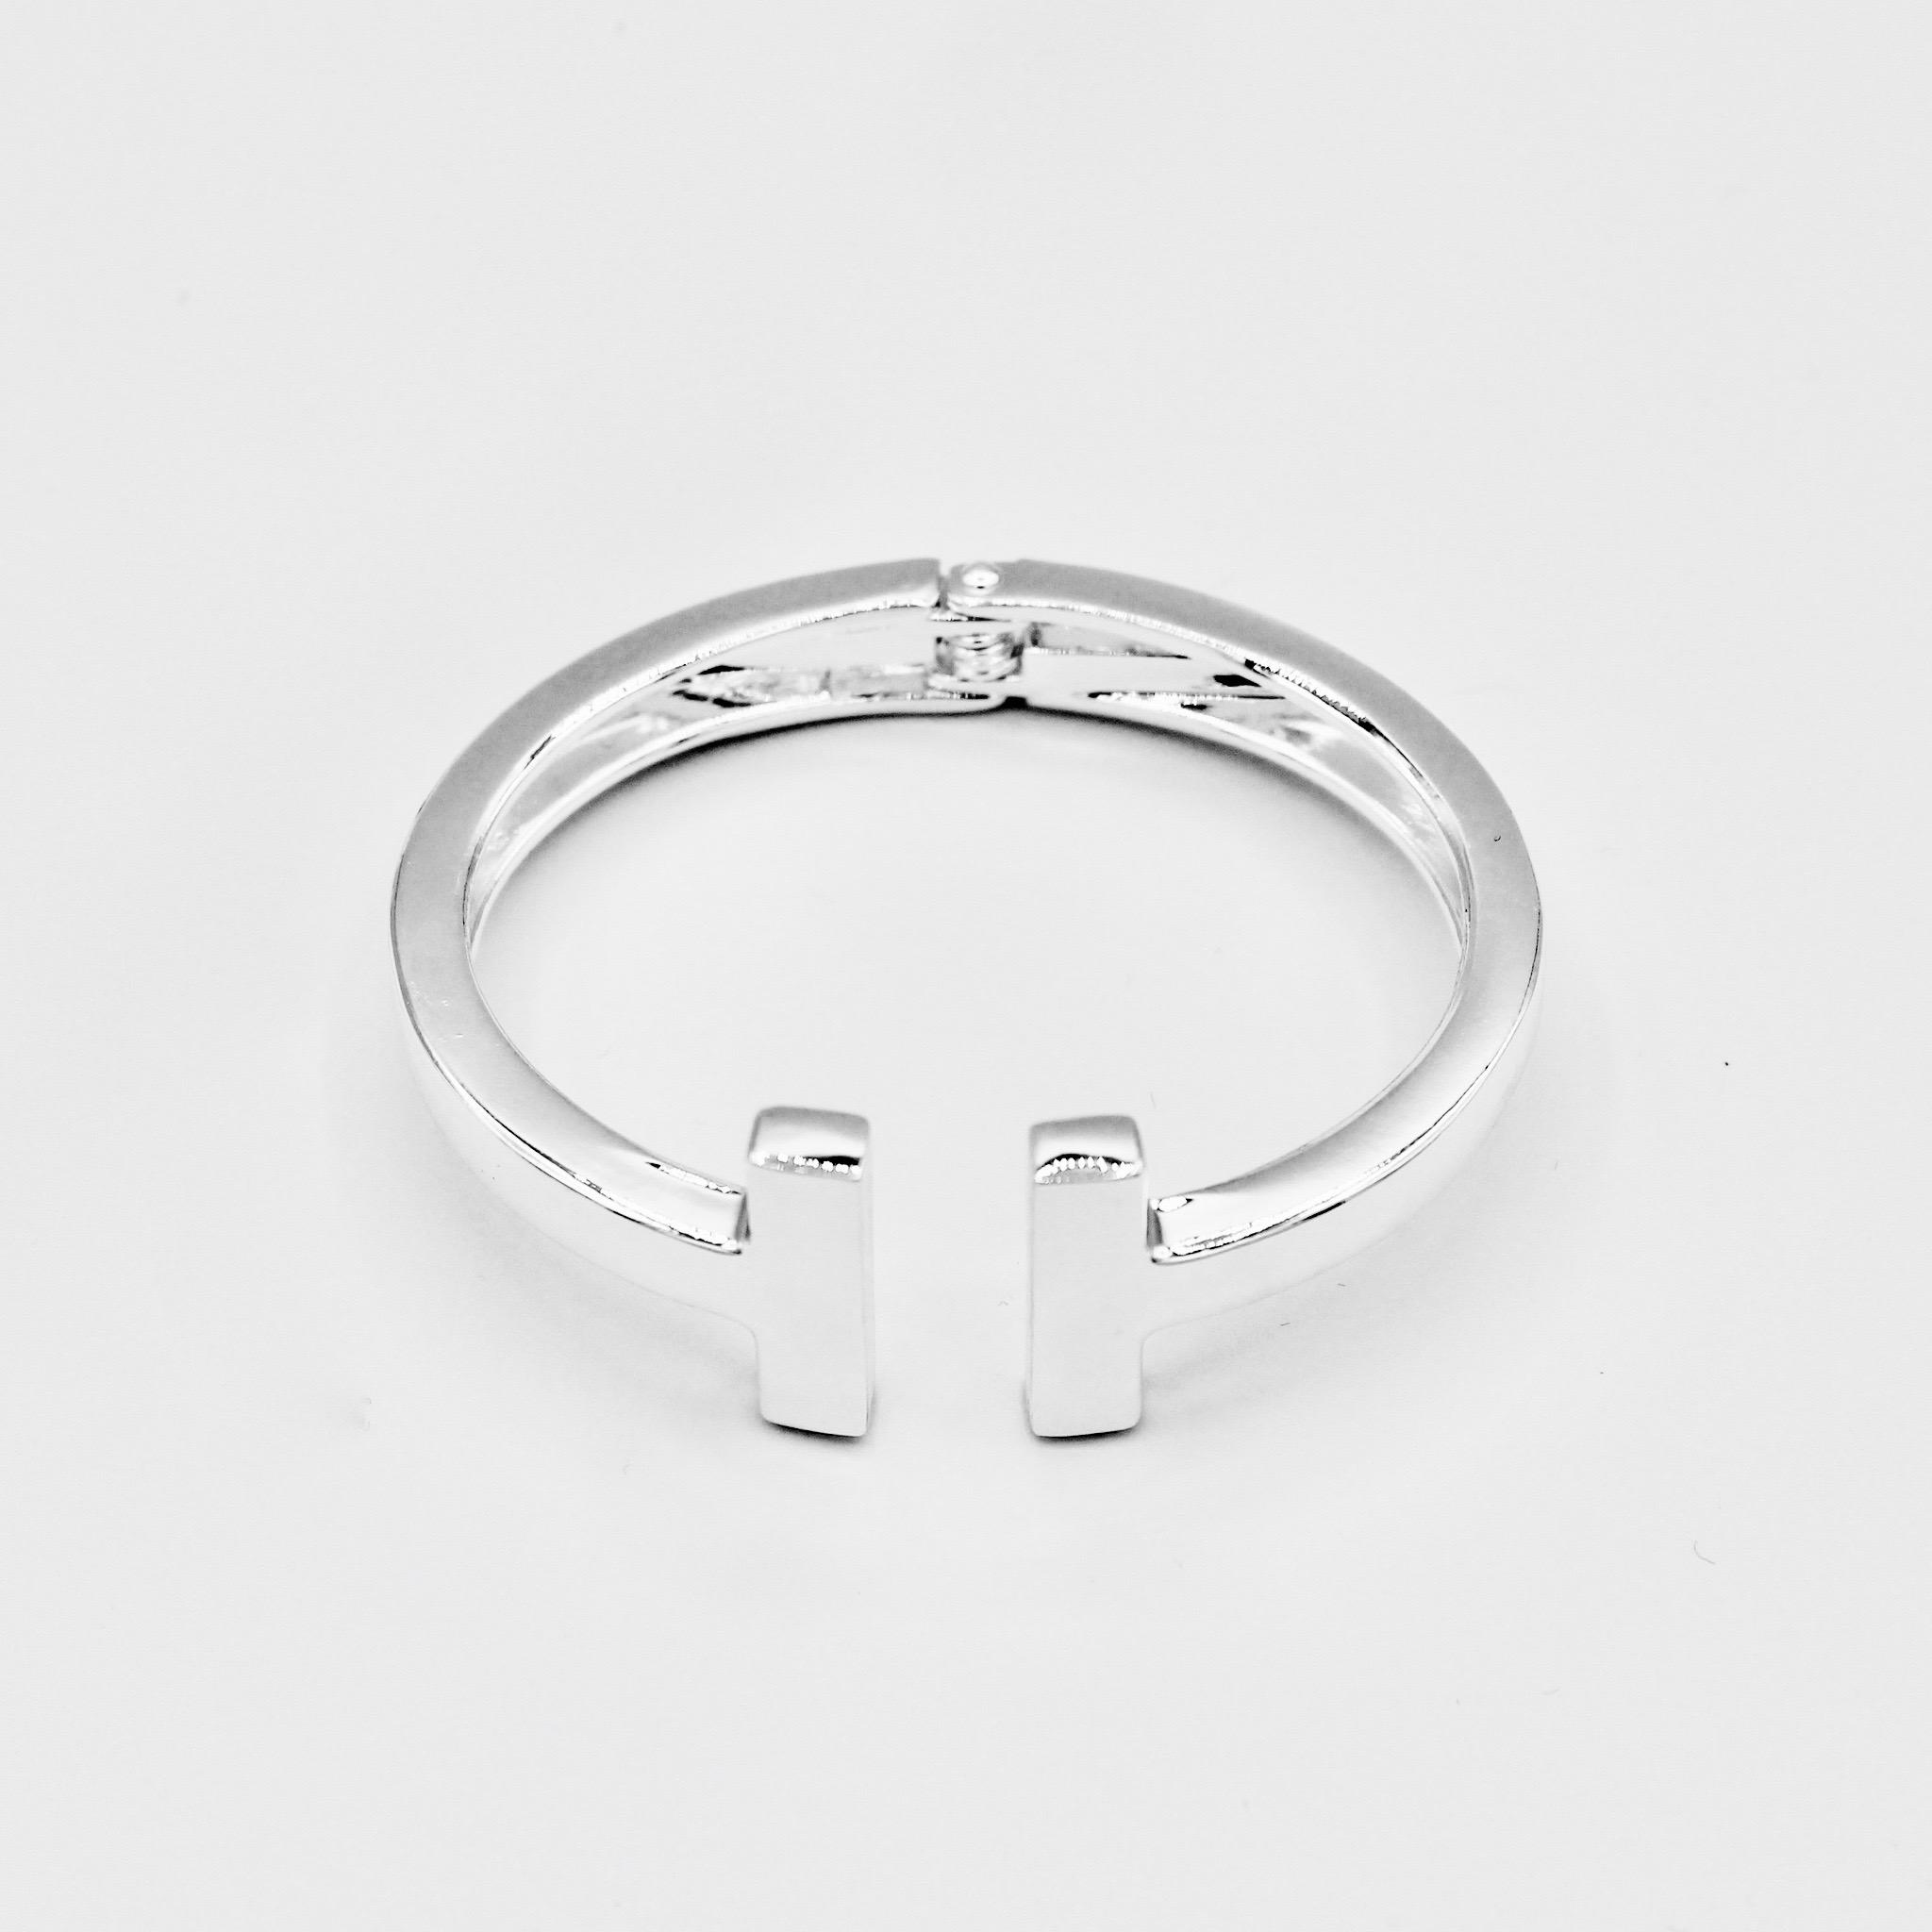 Silver T-Bar (Tiffany Style) Bracelet